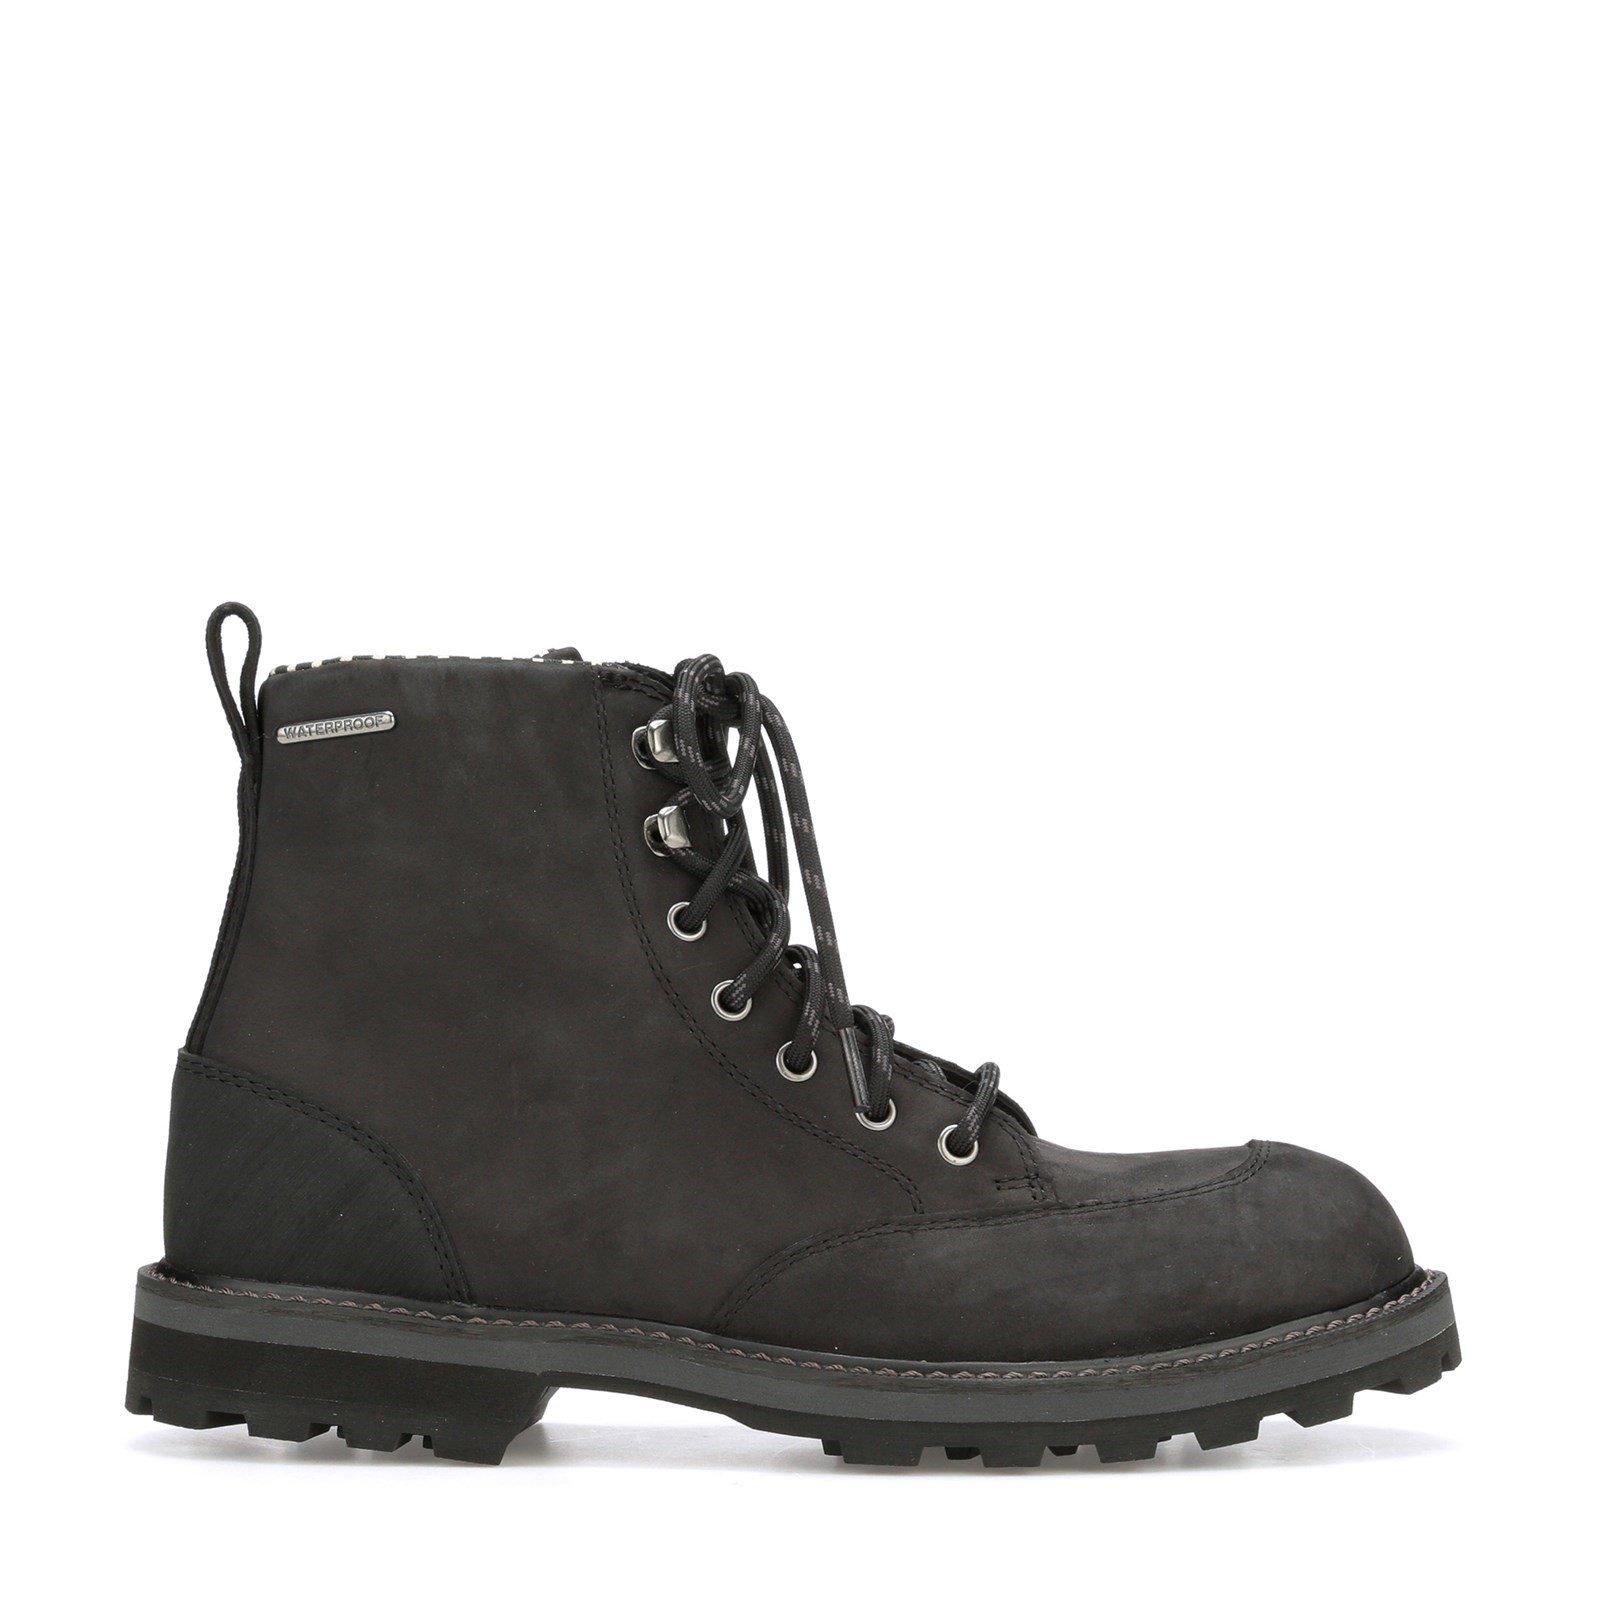 Muck Boots Men's Foreman Boot Black 31854 - Black 9